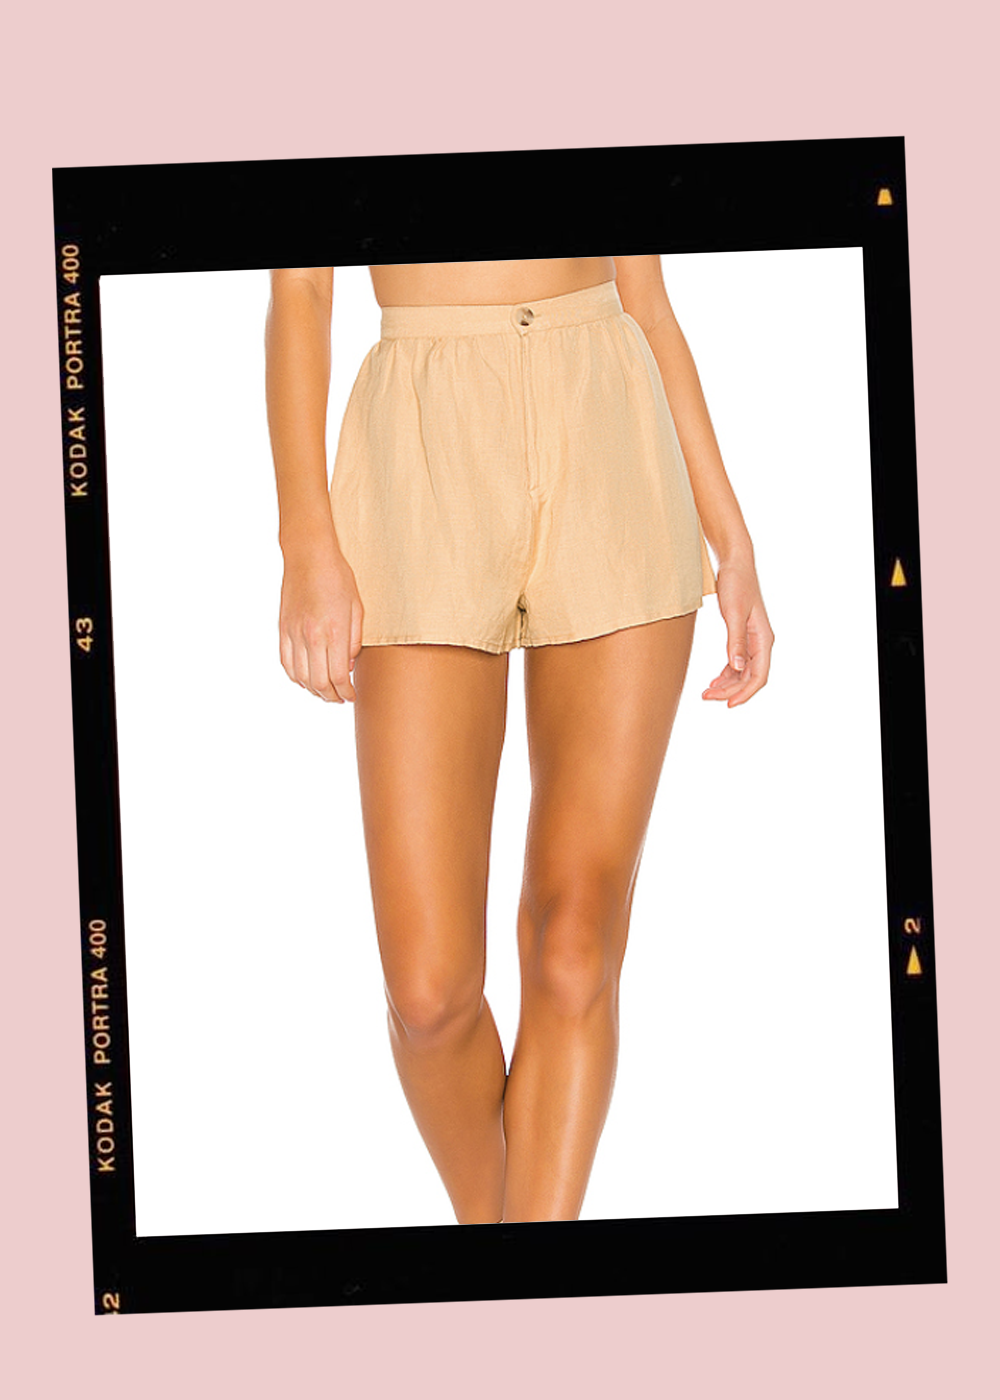 001. - High Waisted Shorts // $50Amuse Society